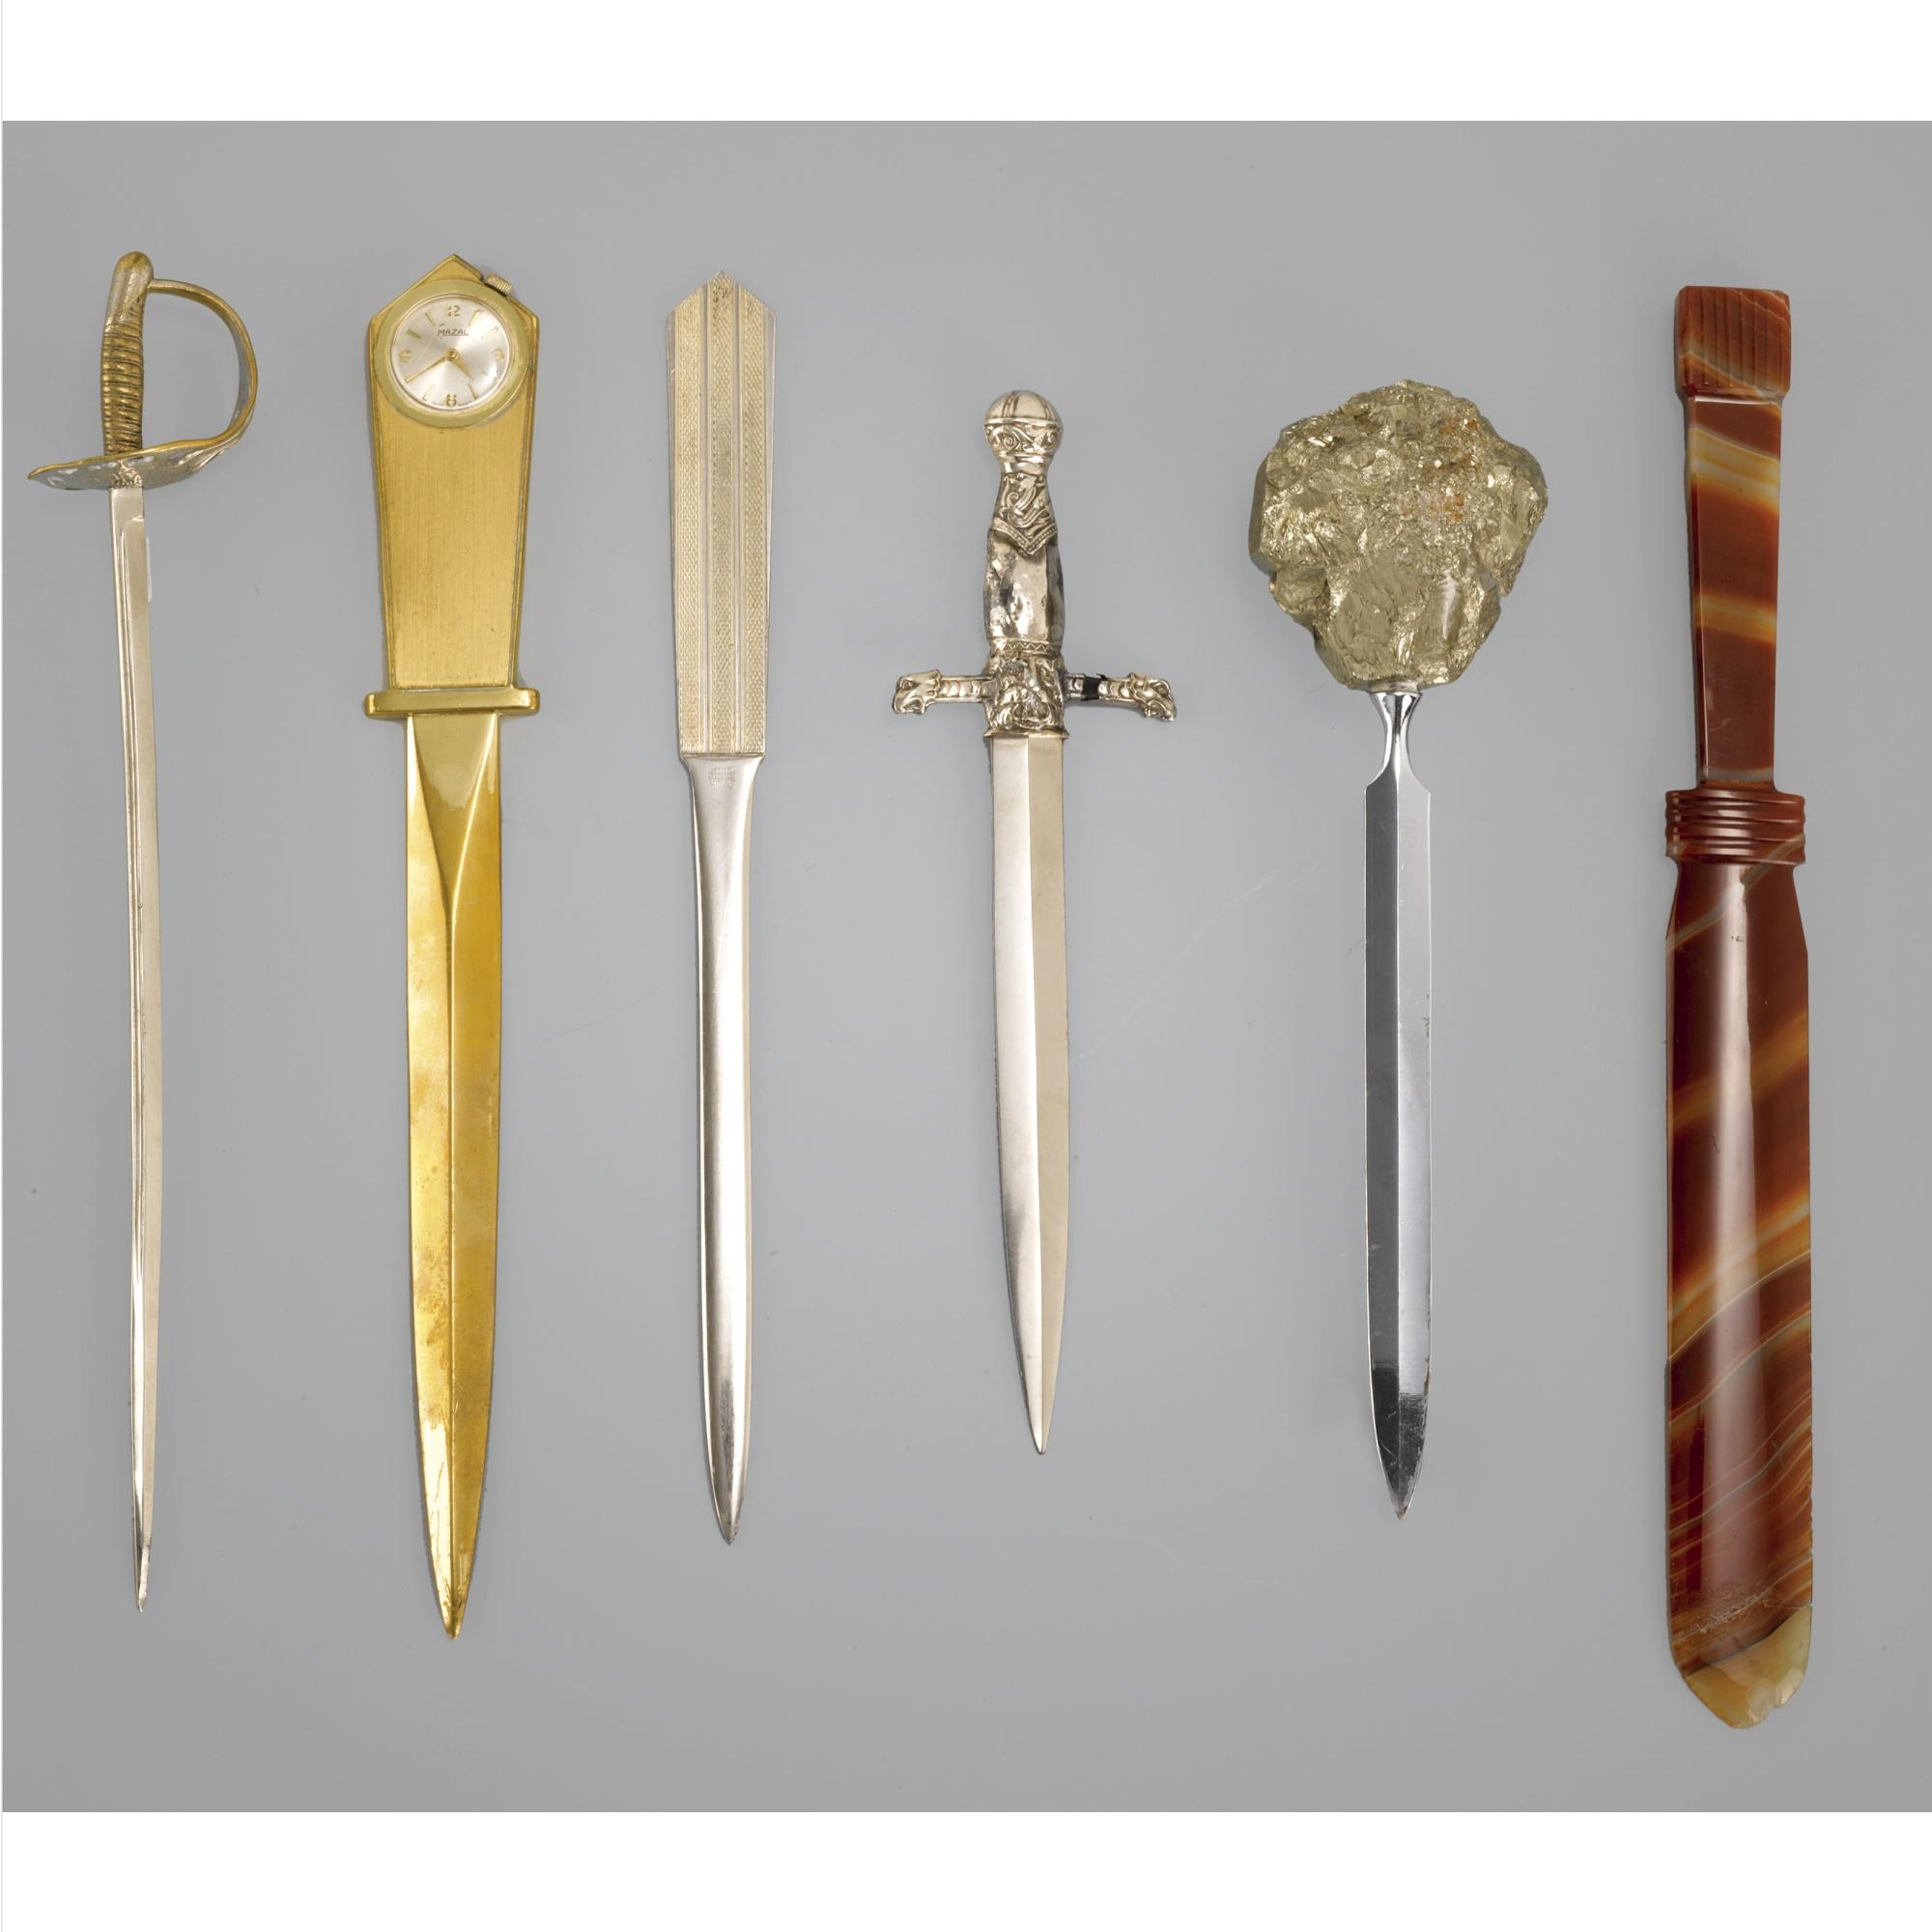 Six metal letter openers, modern